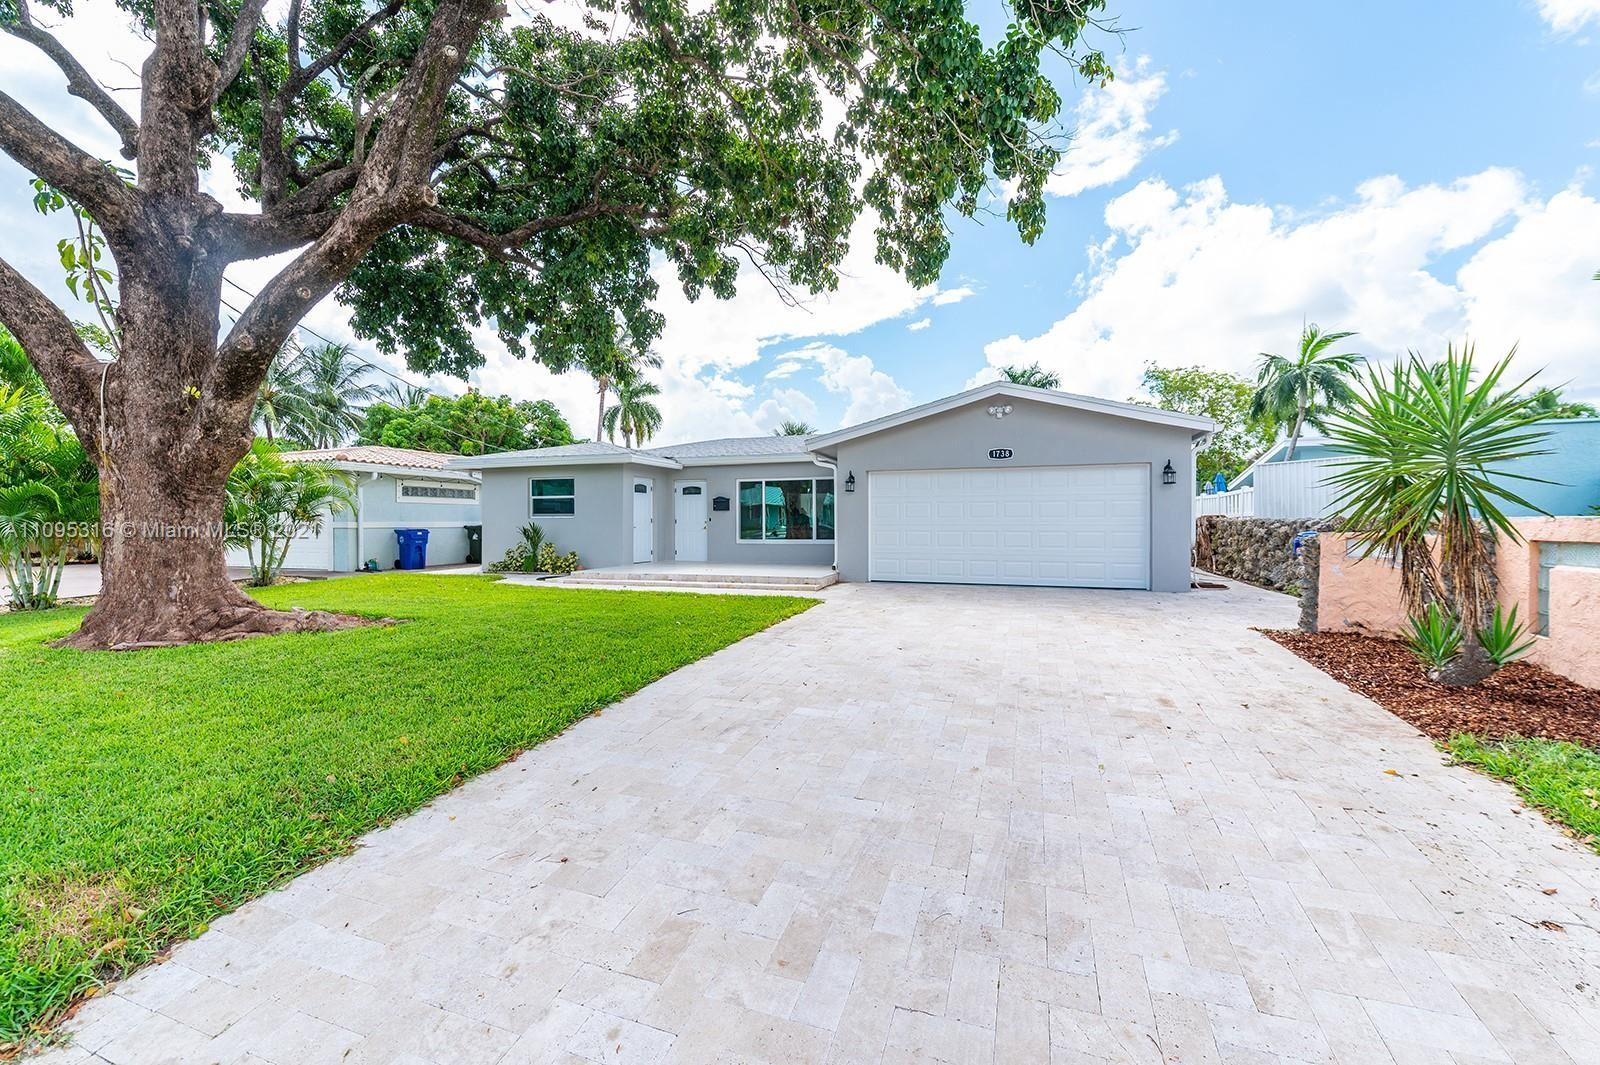 Photo of 1738 W Las Olas Blvd, Fort Lauderdale, FL 33312 (MLS # A11095316)